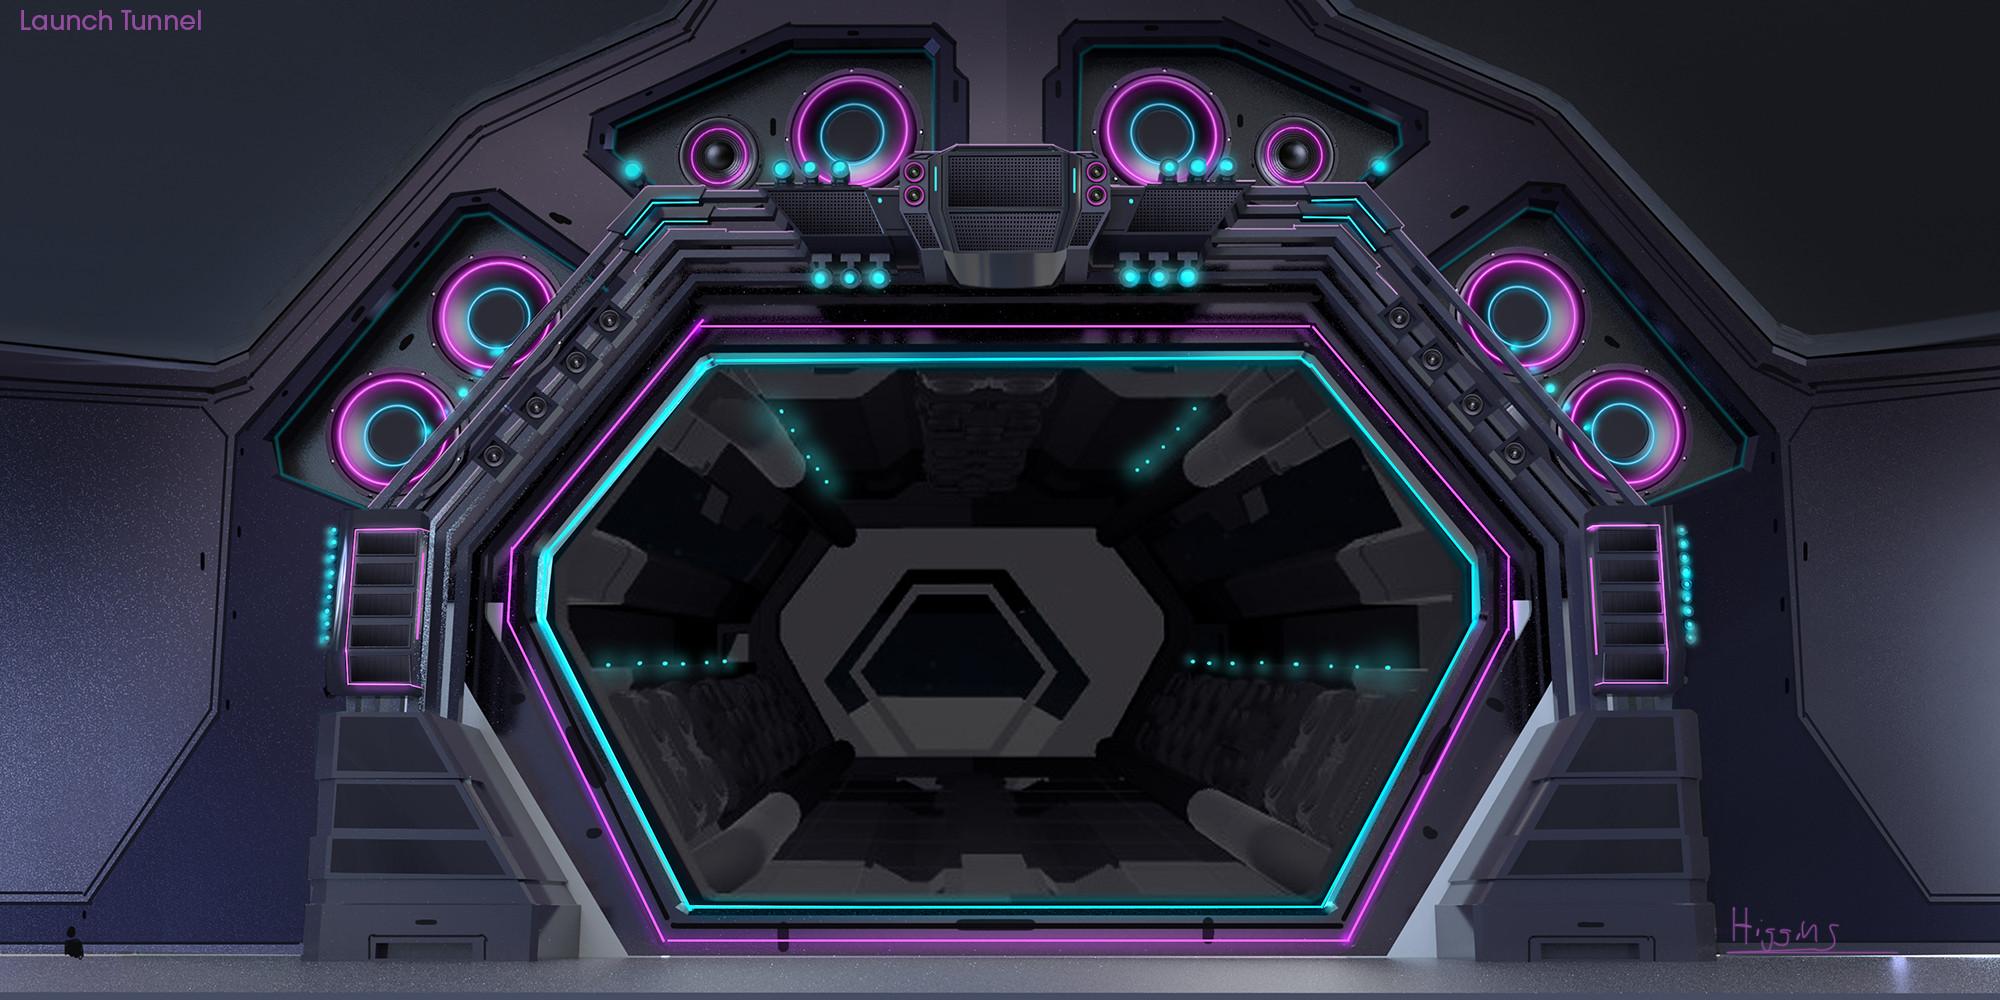 Hub launch tunnel